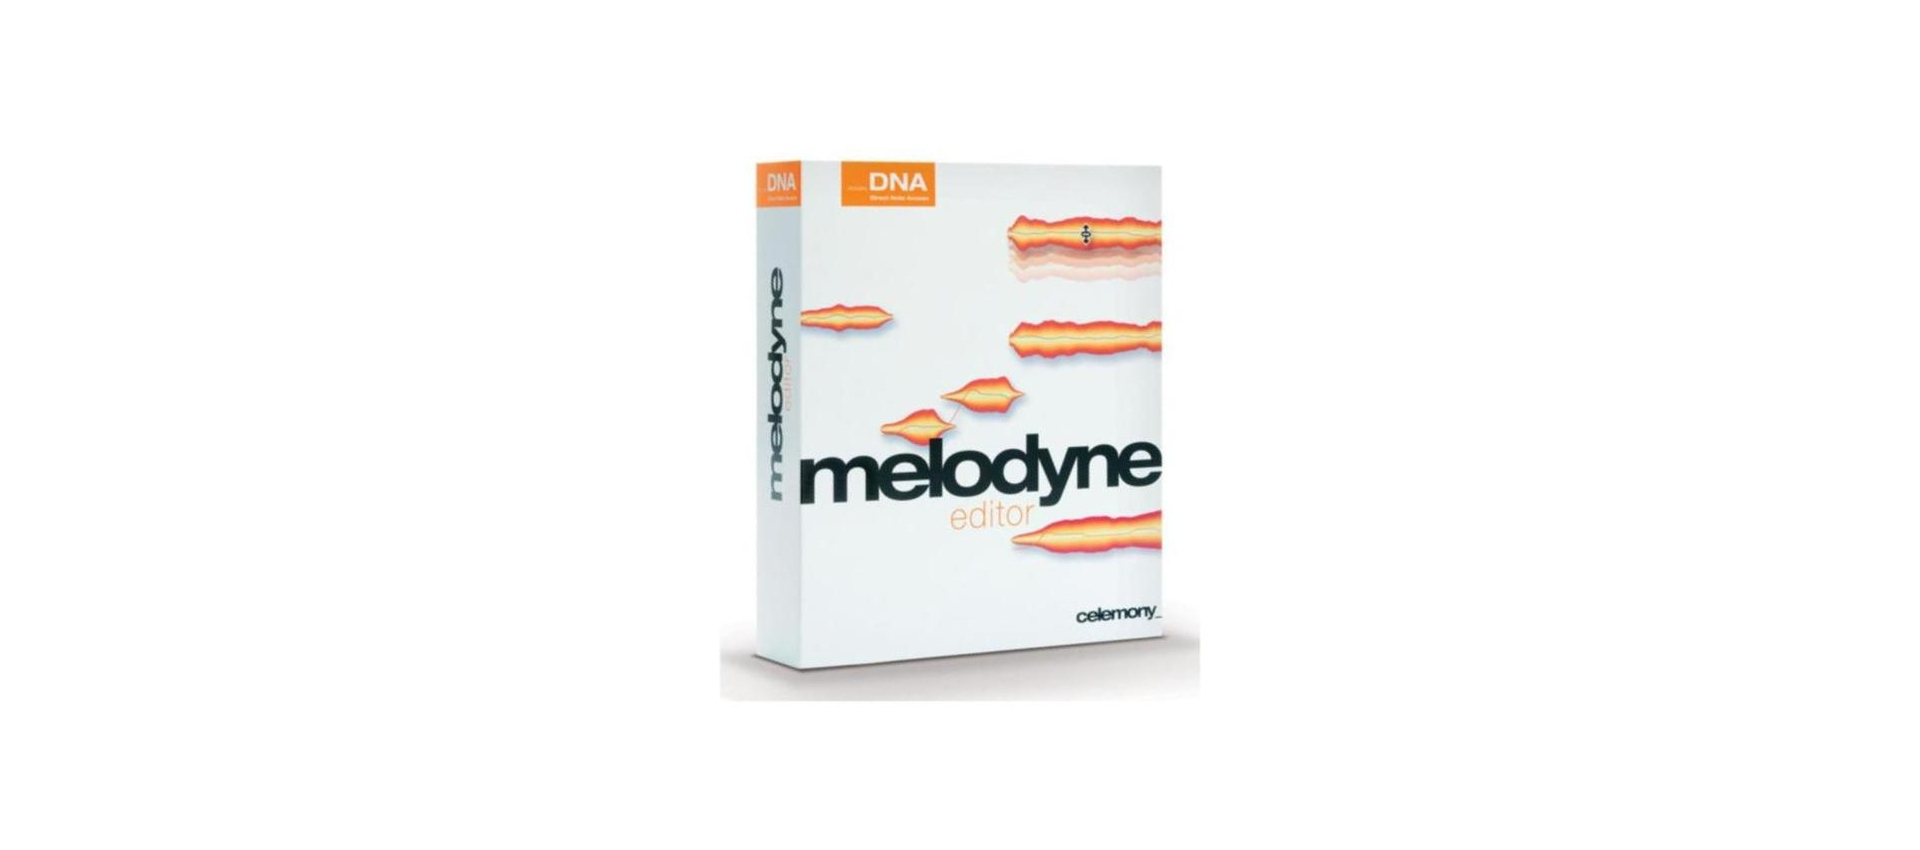 Celemony melodyne editor 2 crack - klonunnaageh's blog